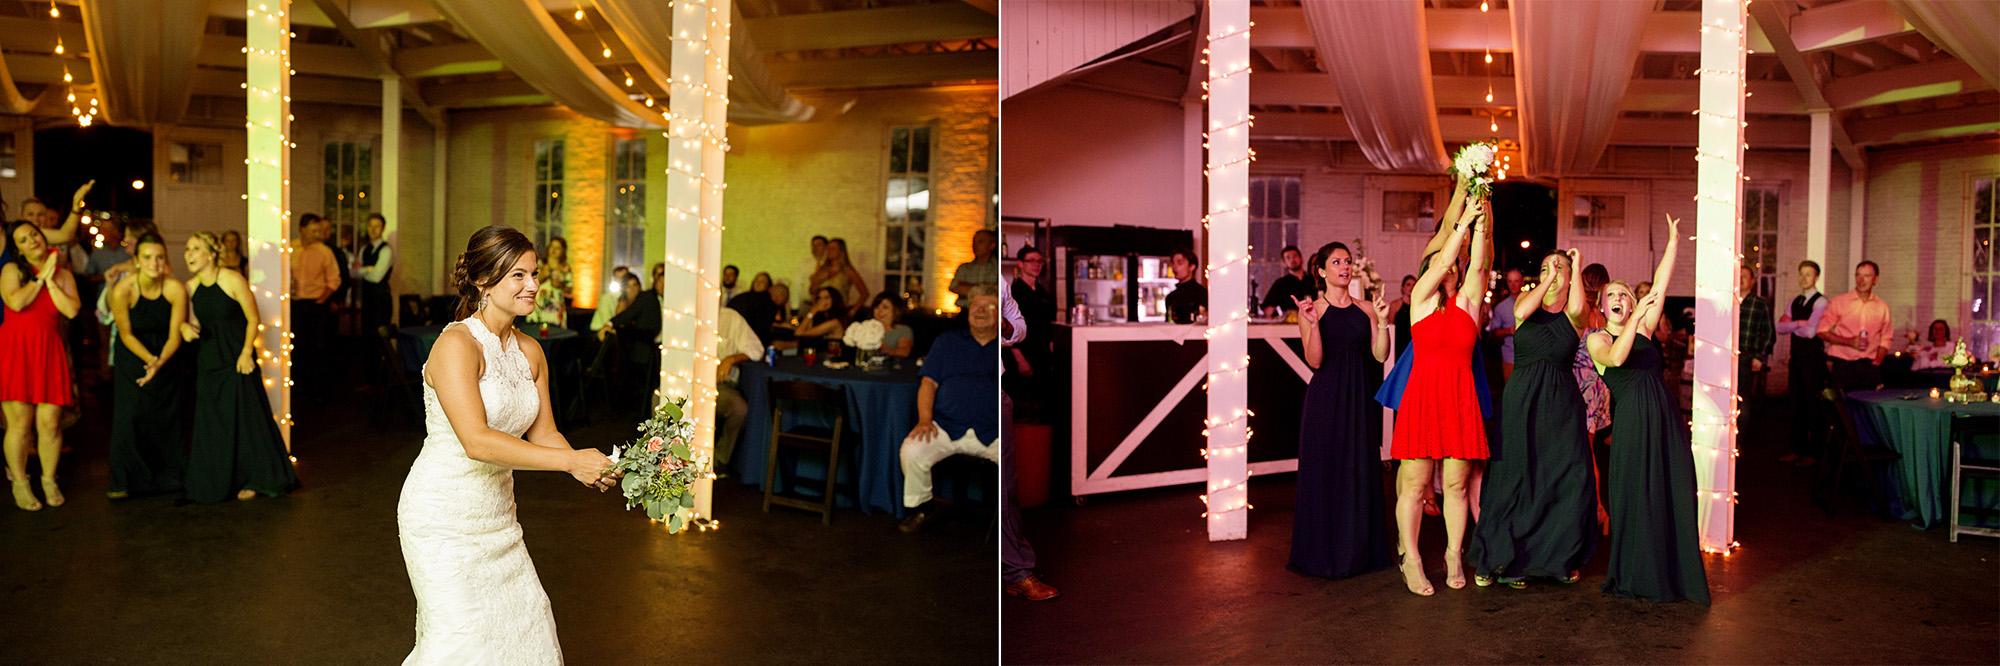 Seriously_Sabrina_Photography_Lexington_Kentucky_Round_Barn_Red_Mile_Stable_of_Memories_Wedding_Hart_127.jpg